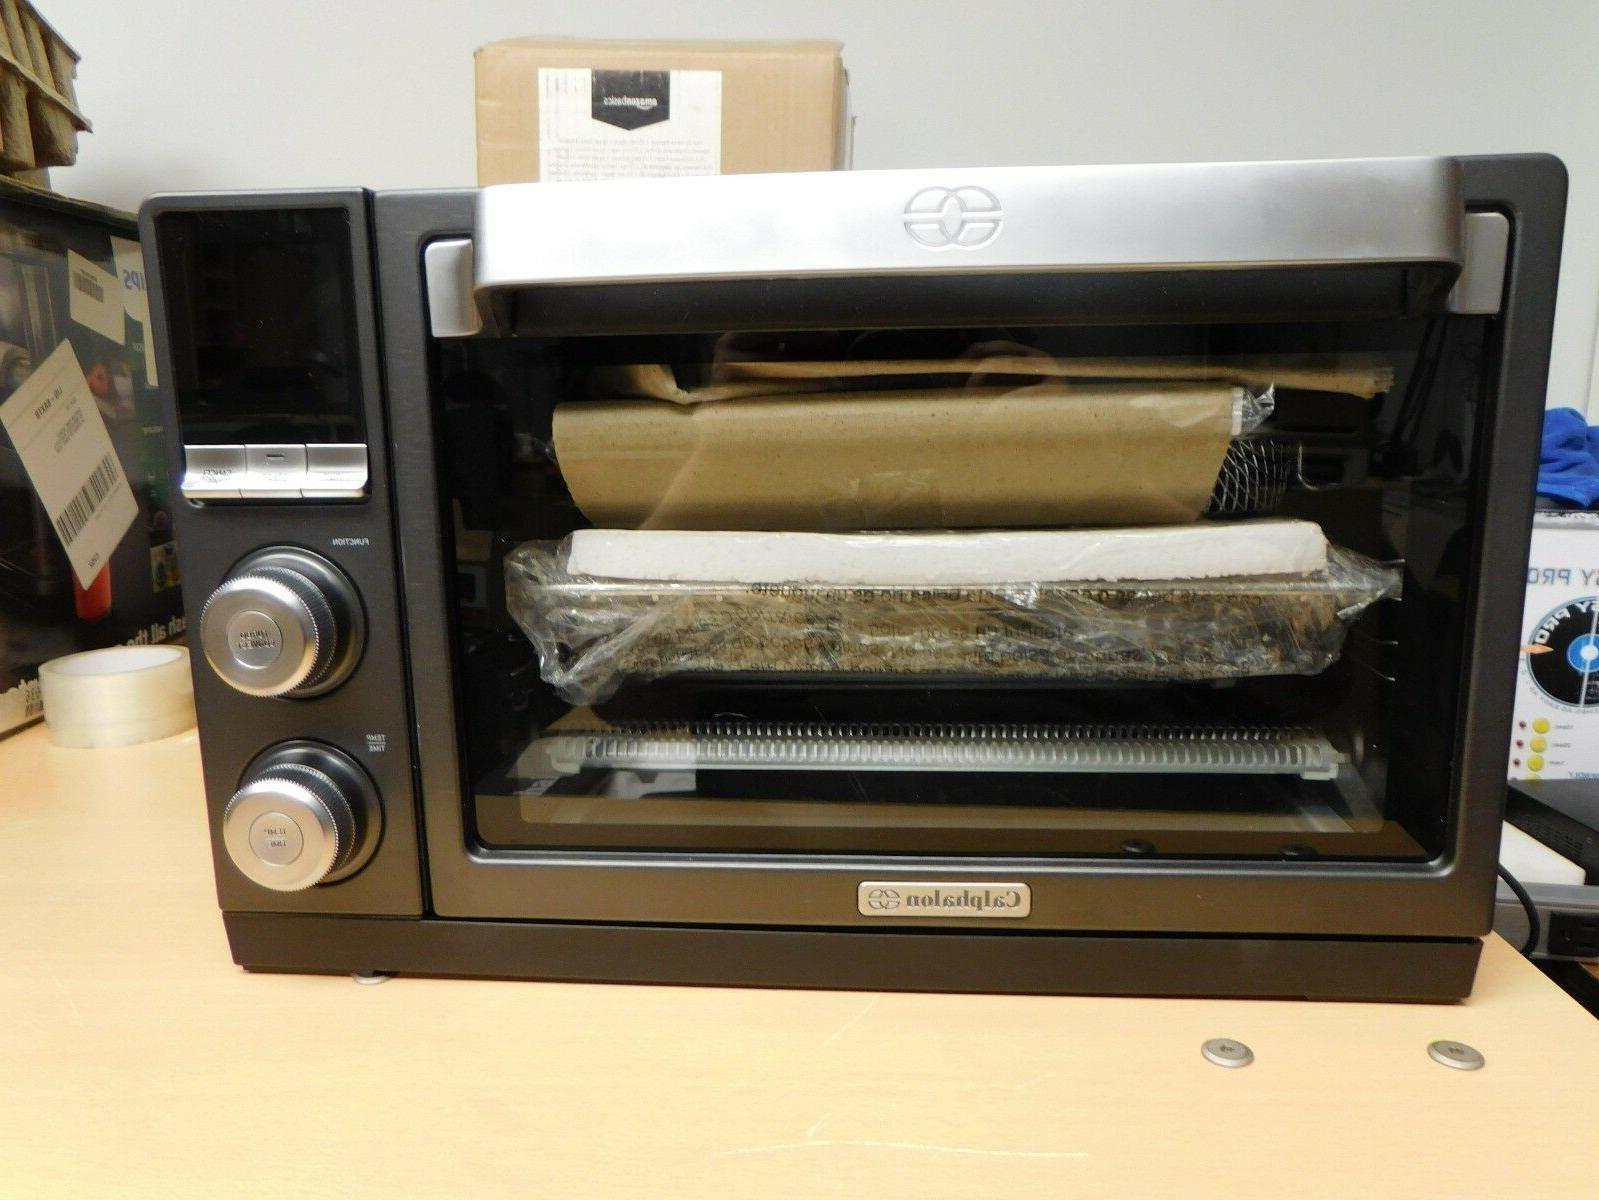 quartz heat convection toaster oven brand new